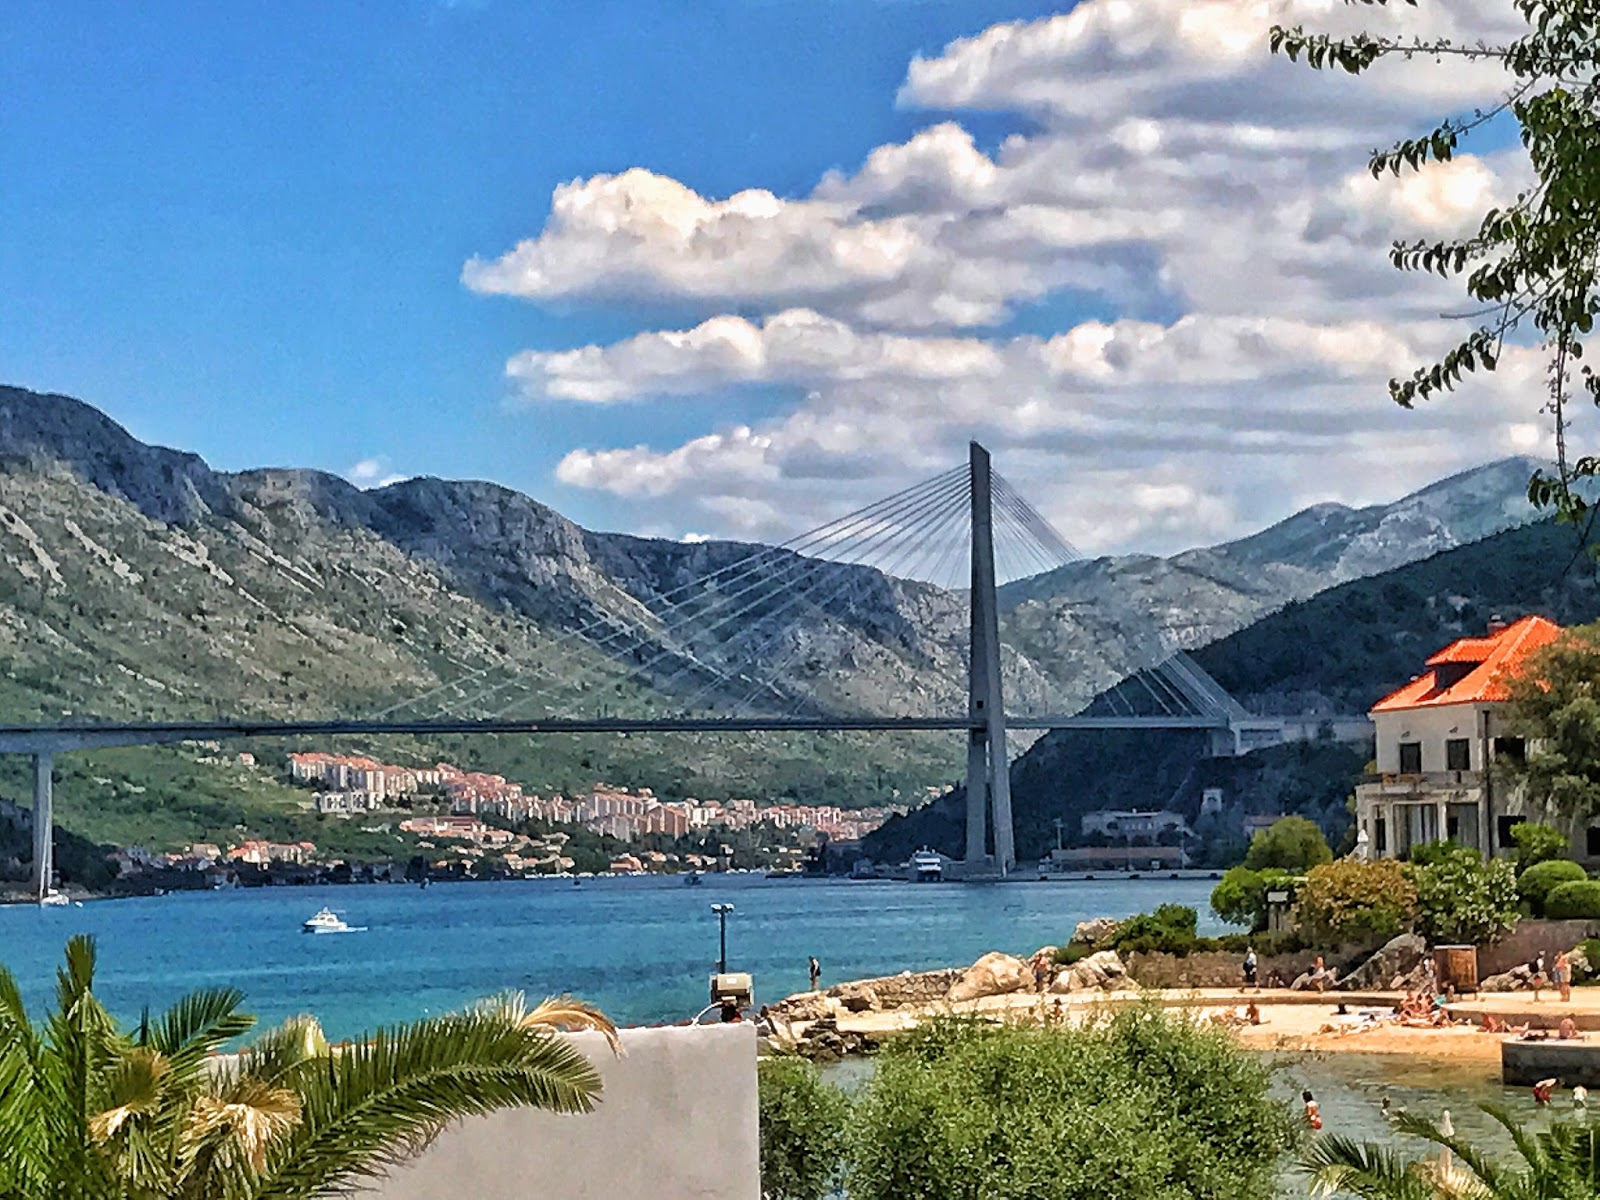 Dubrovnik suspension bridge view from Copacabana beach